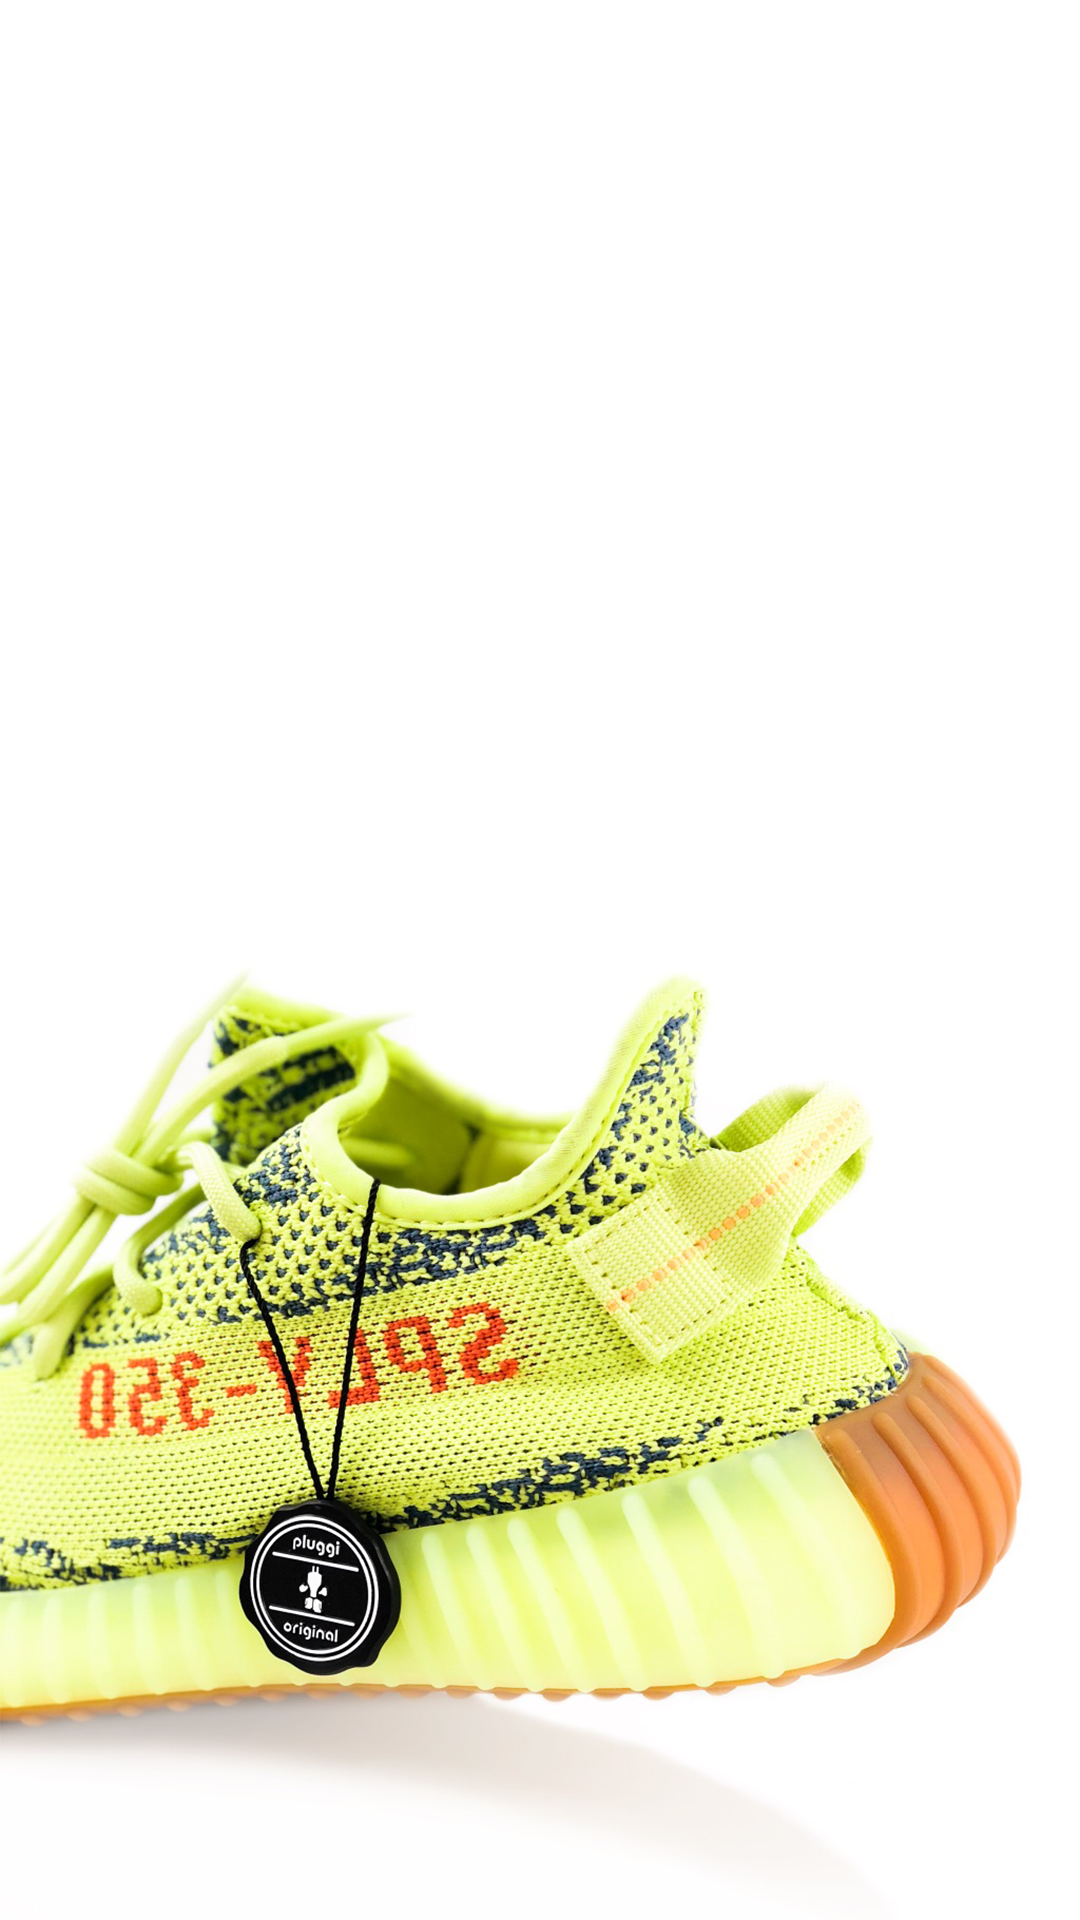 adidas yeezy boost orange gelb